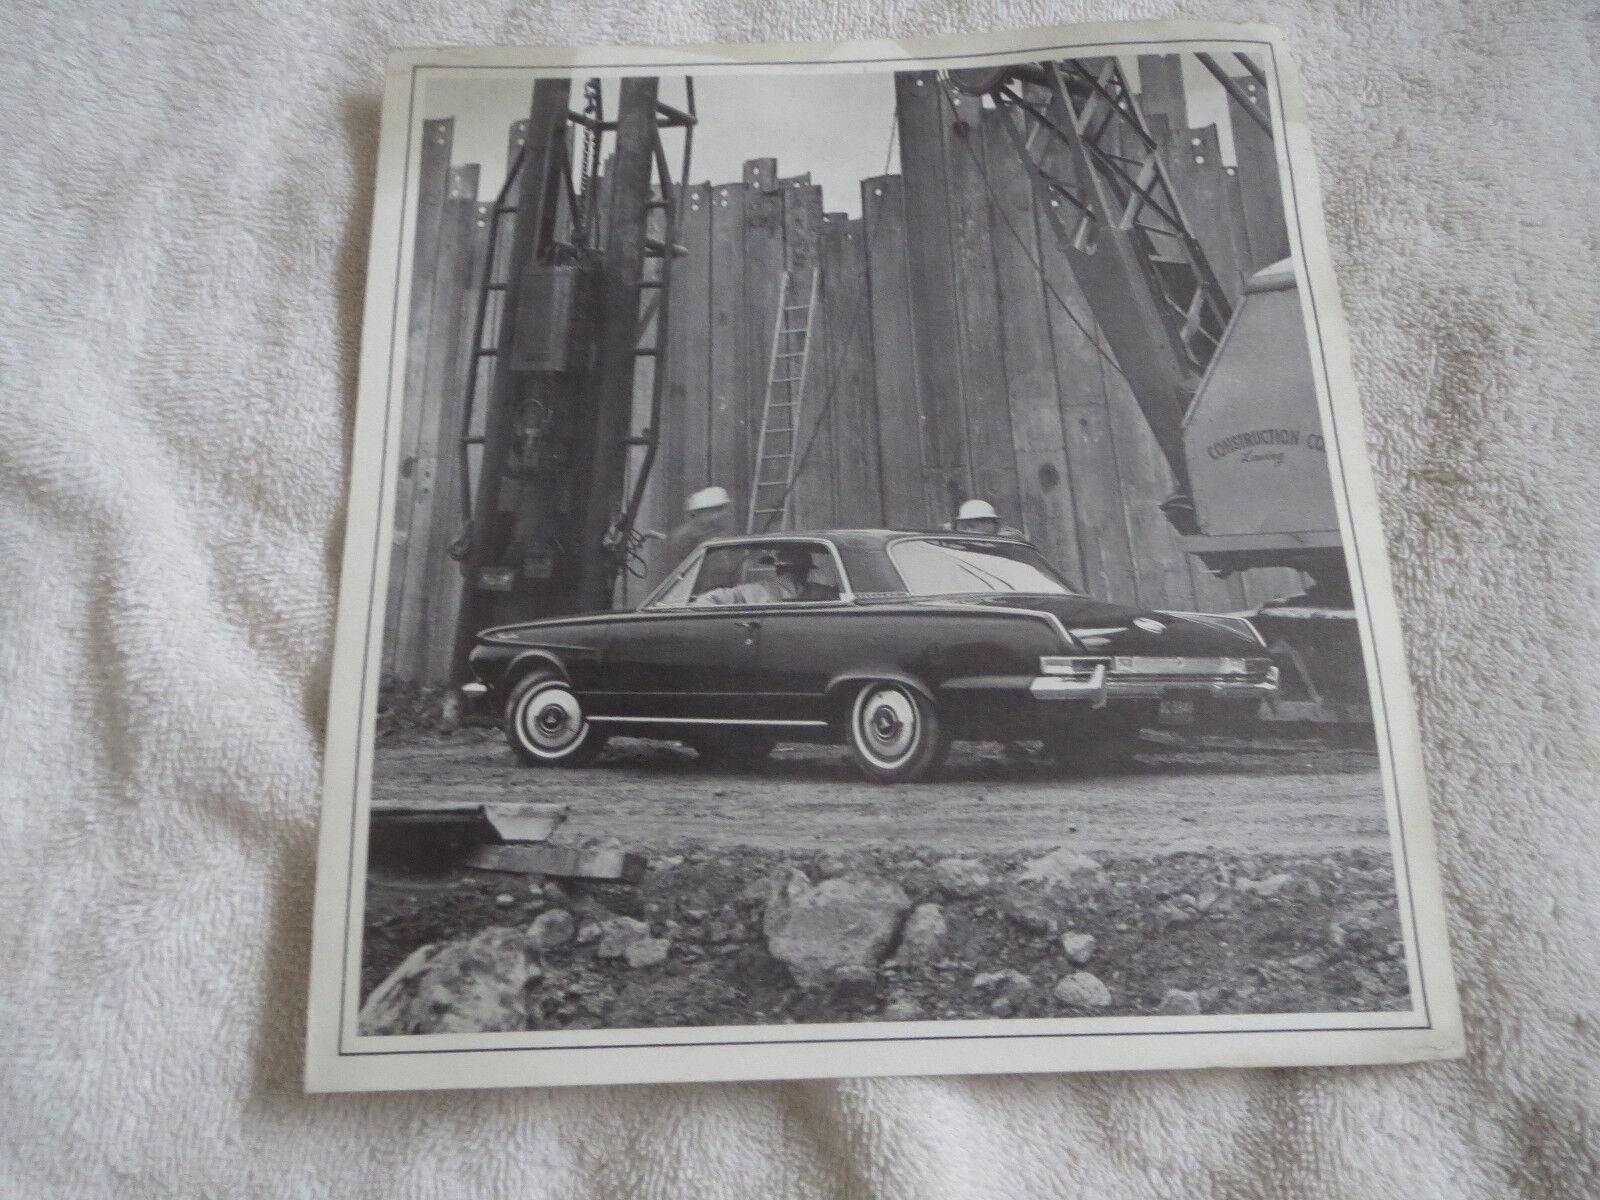 1963 PLYMOUTH VALIANT FLEET CAR FOR BUSINESS ORIGINAL DEALERSHIP SALES BROCHURE